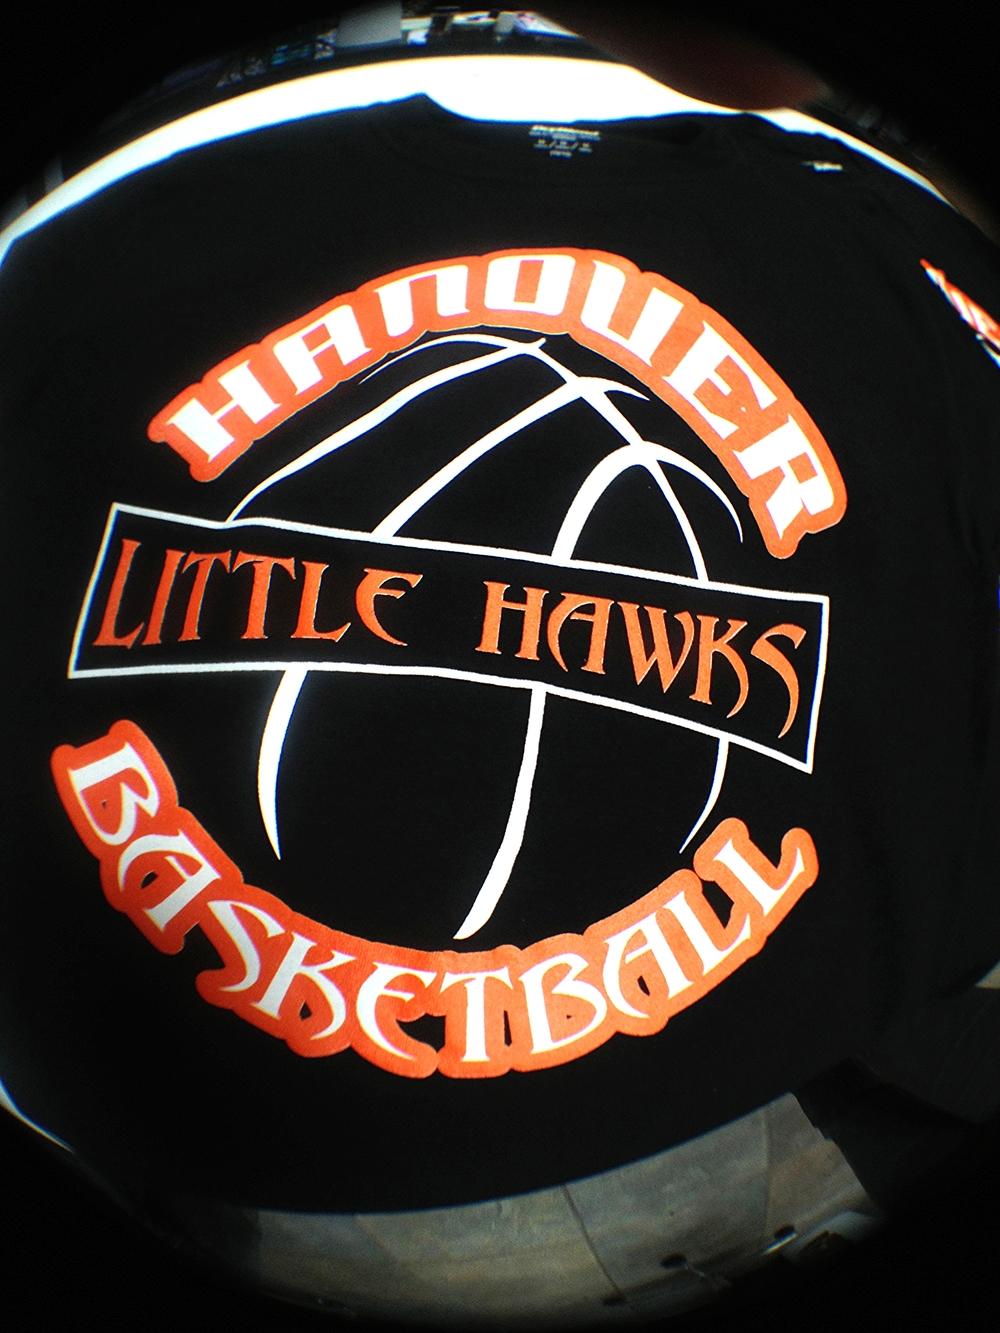 Screen Printing | Hanover Little Hawks Basketball Shirt | Hanover, PA